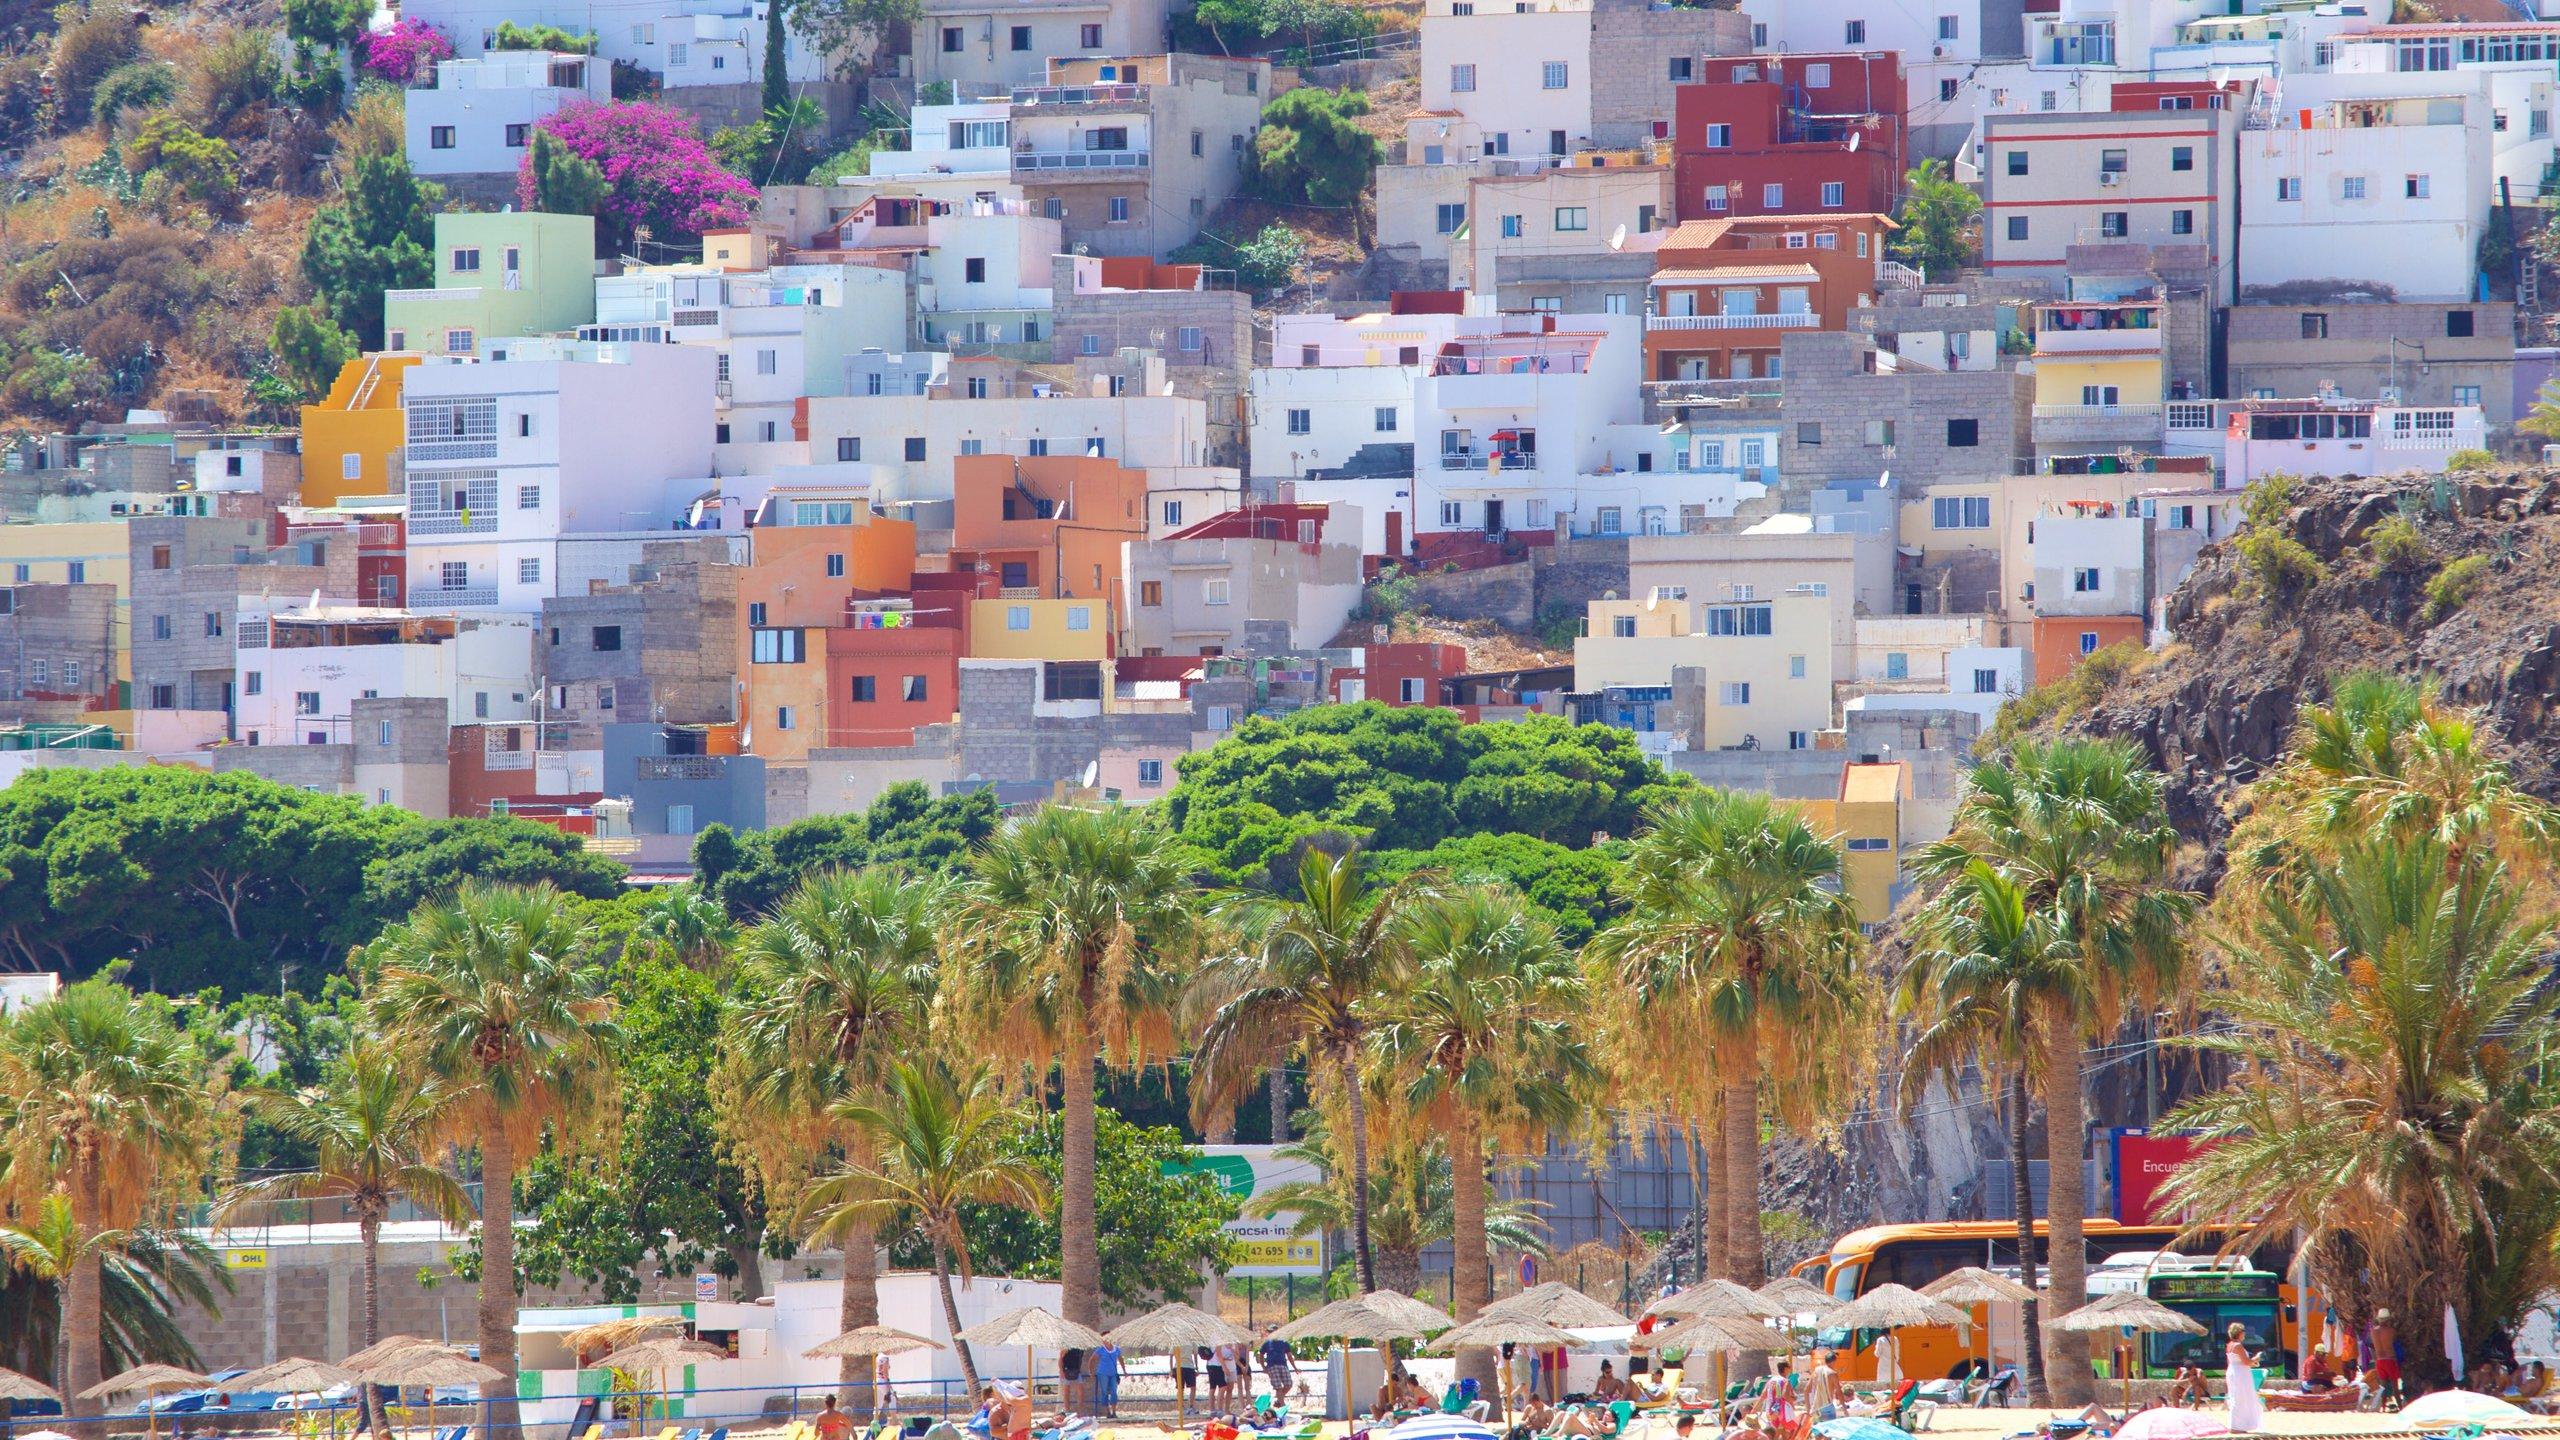 Teresitas Beach, Santa Cruz de Tenerife, Canary Islands, Spain